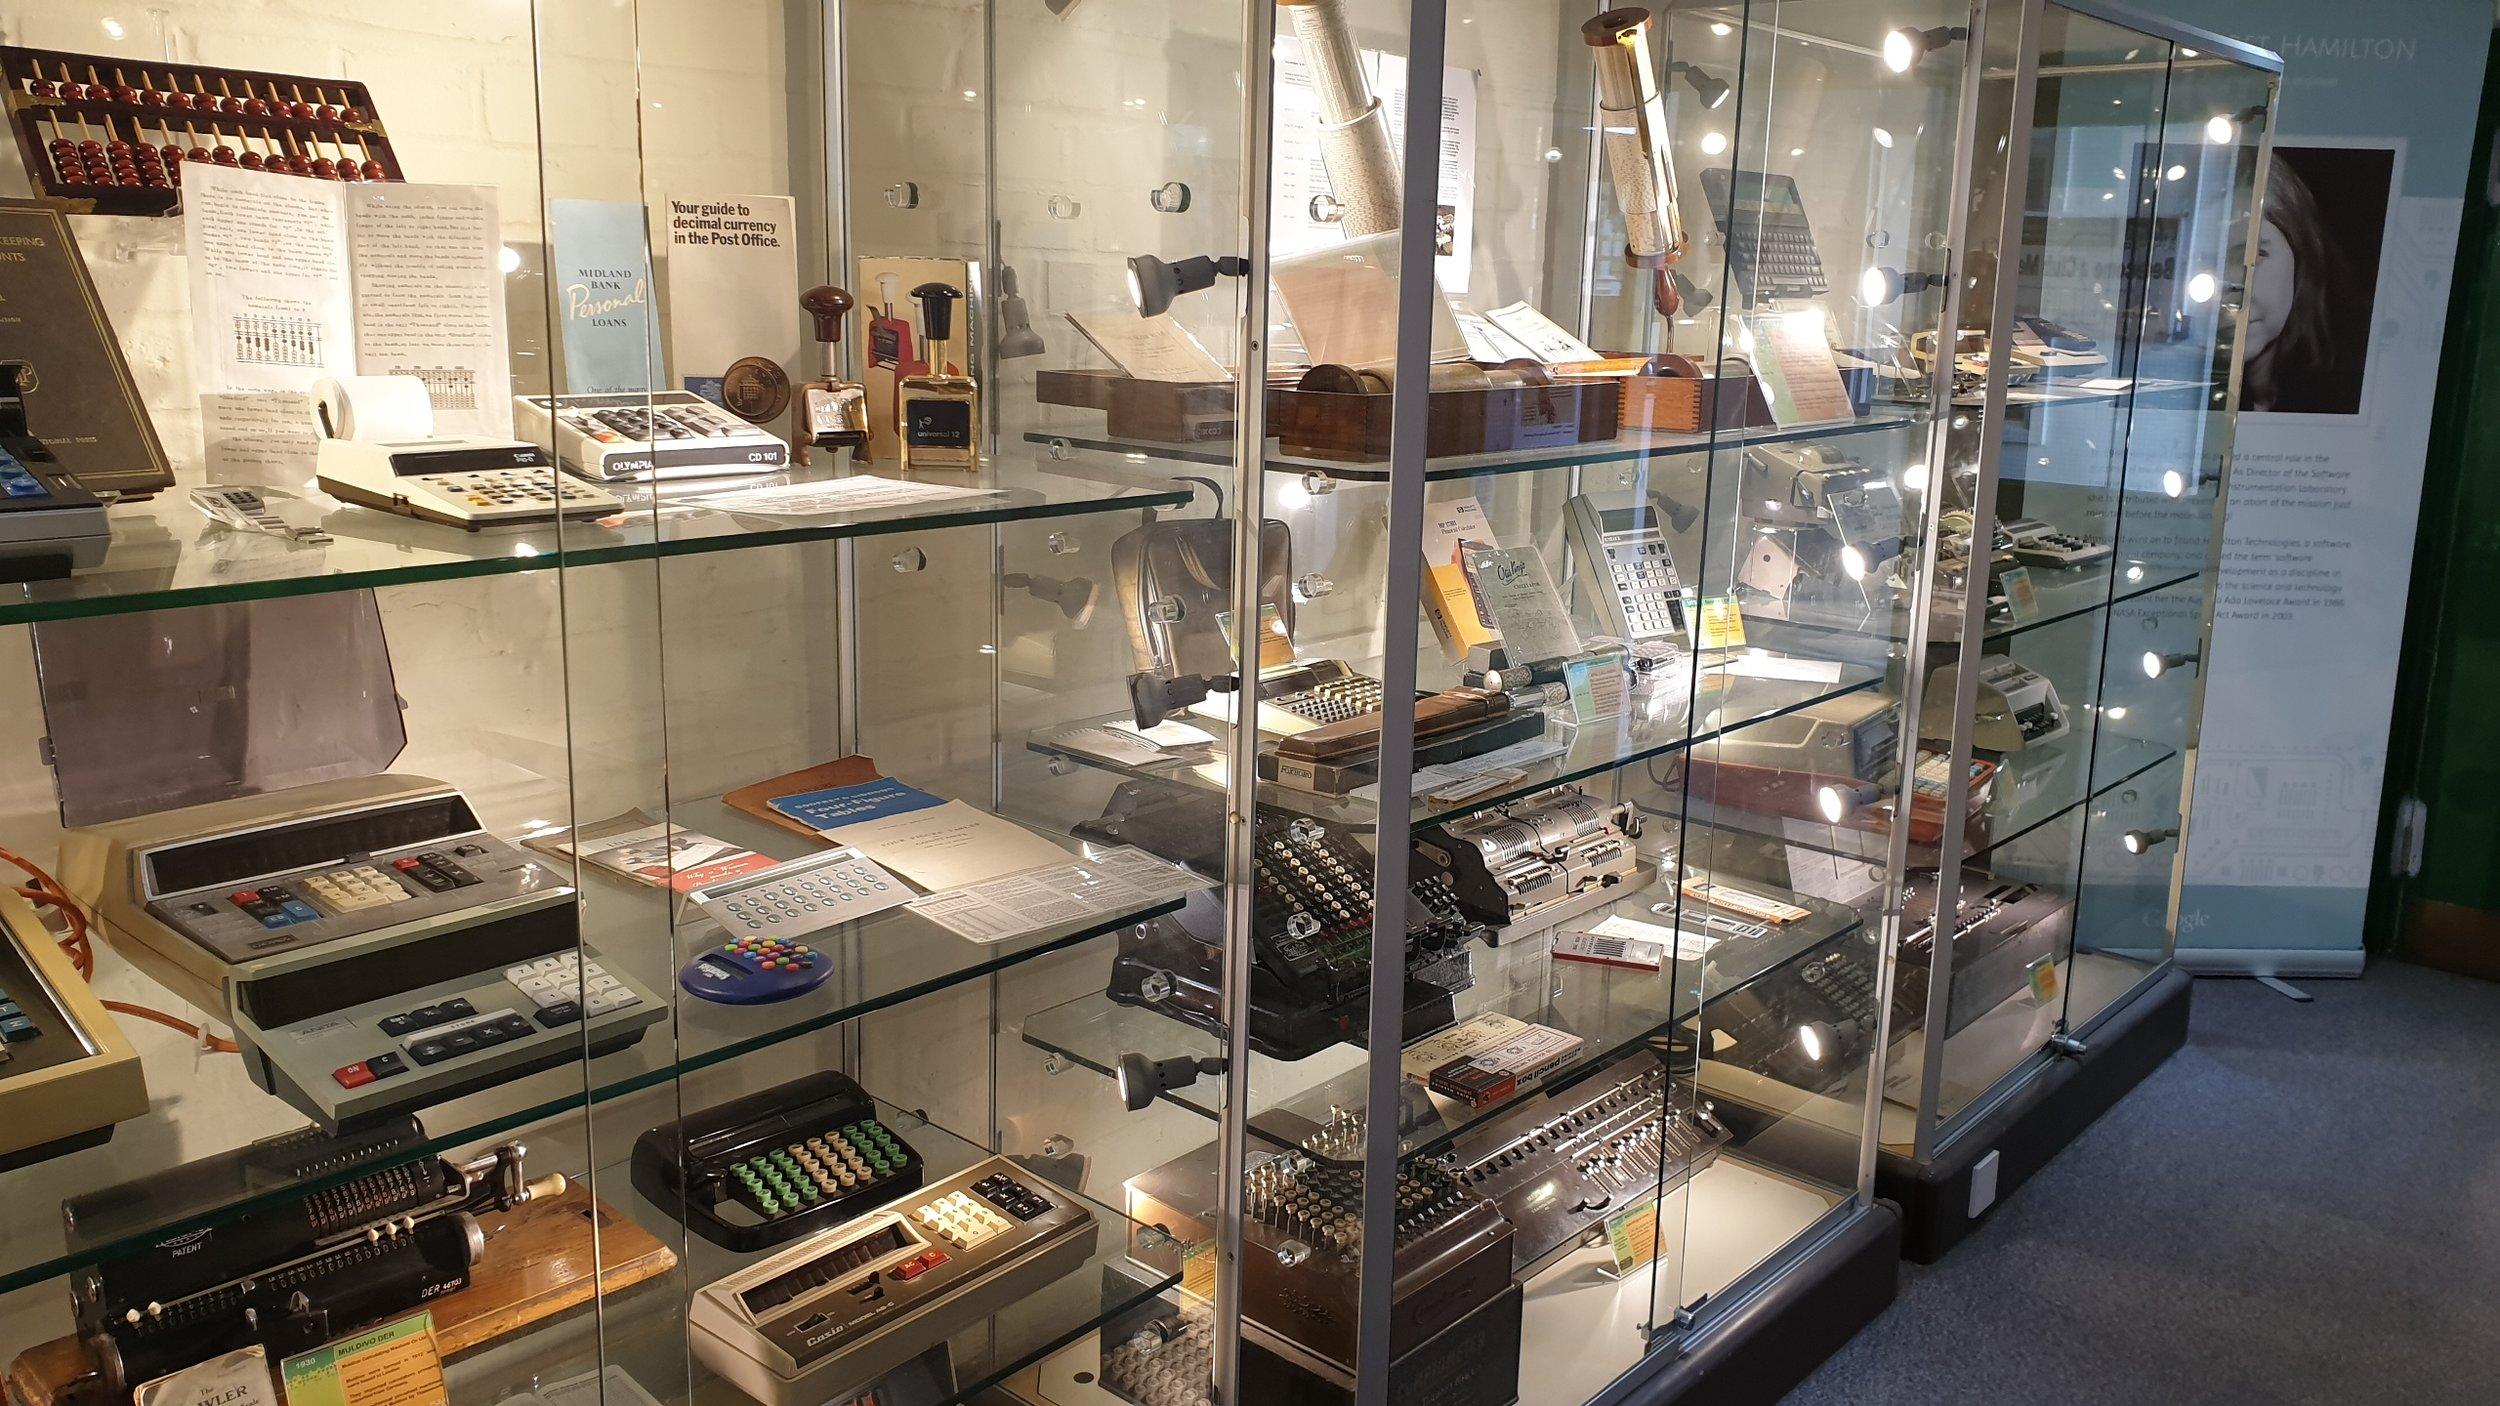 Calculator cabinets